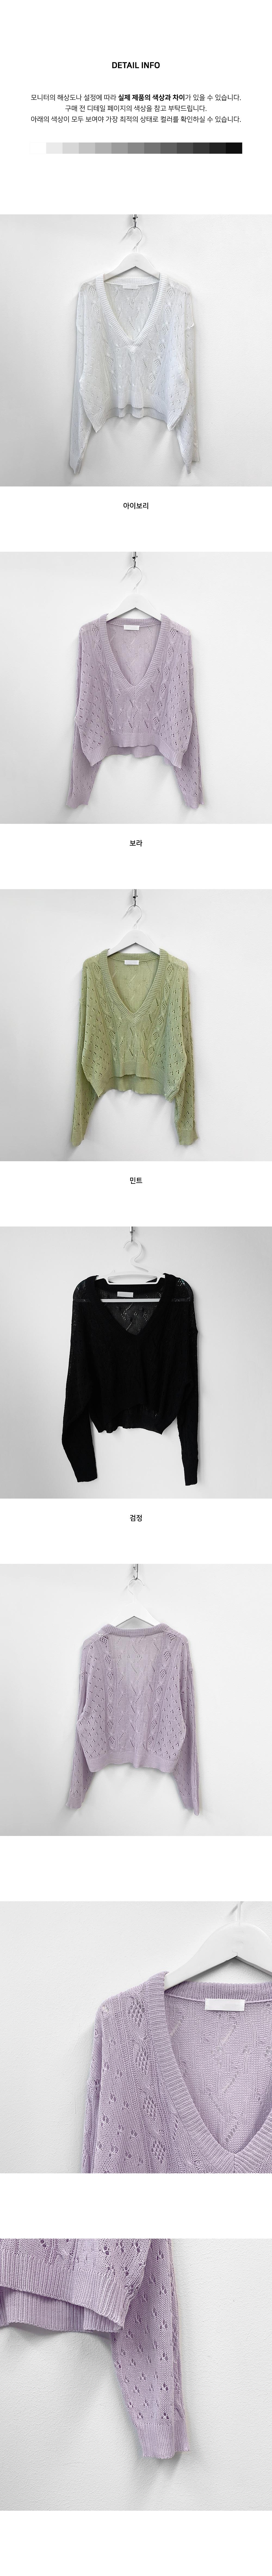 Seasoner Scary Deep V-Neck Crop Layered Knitwear